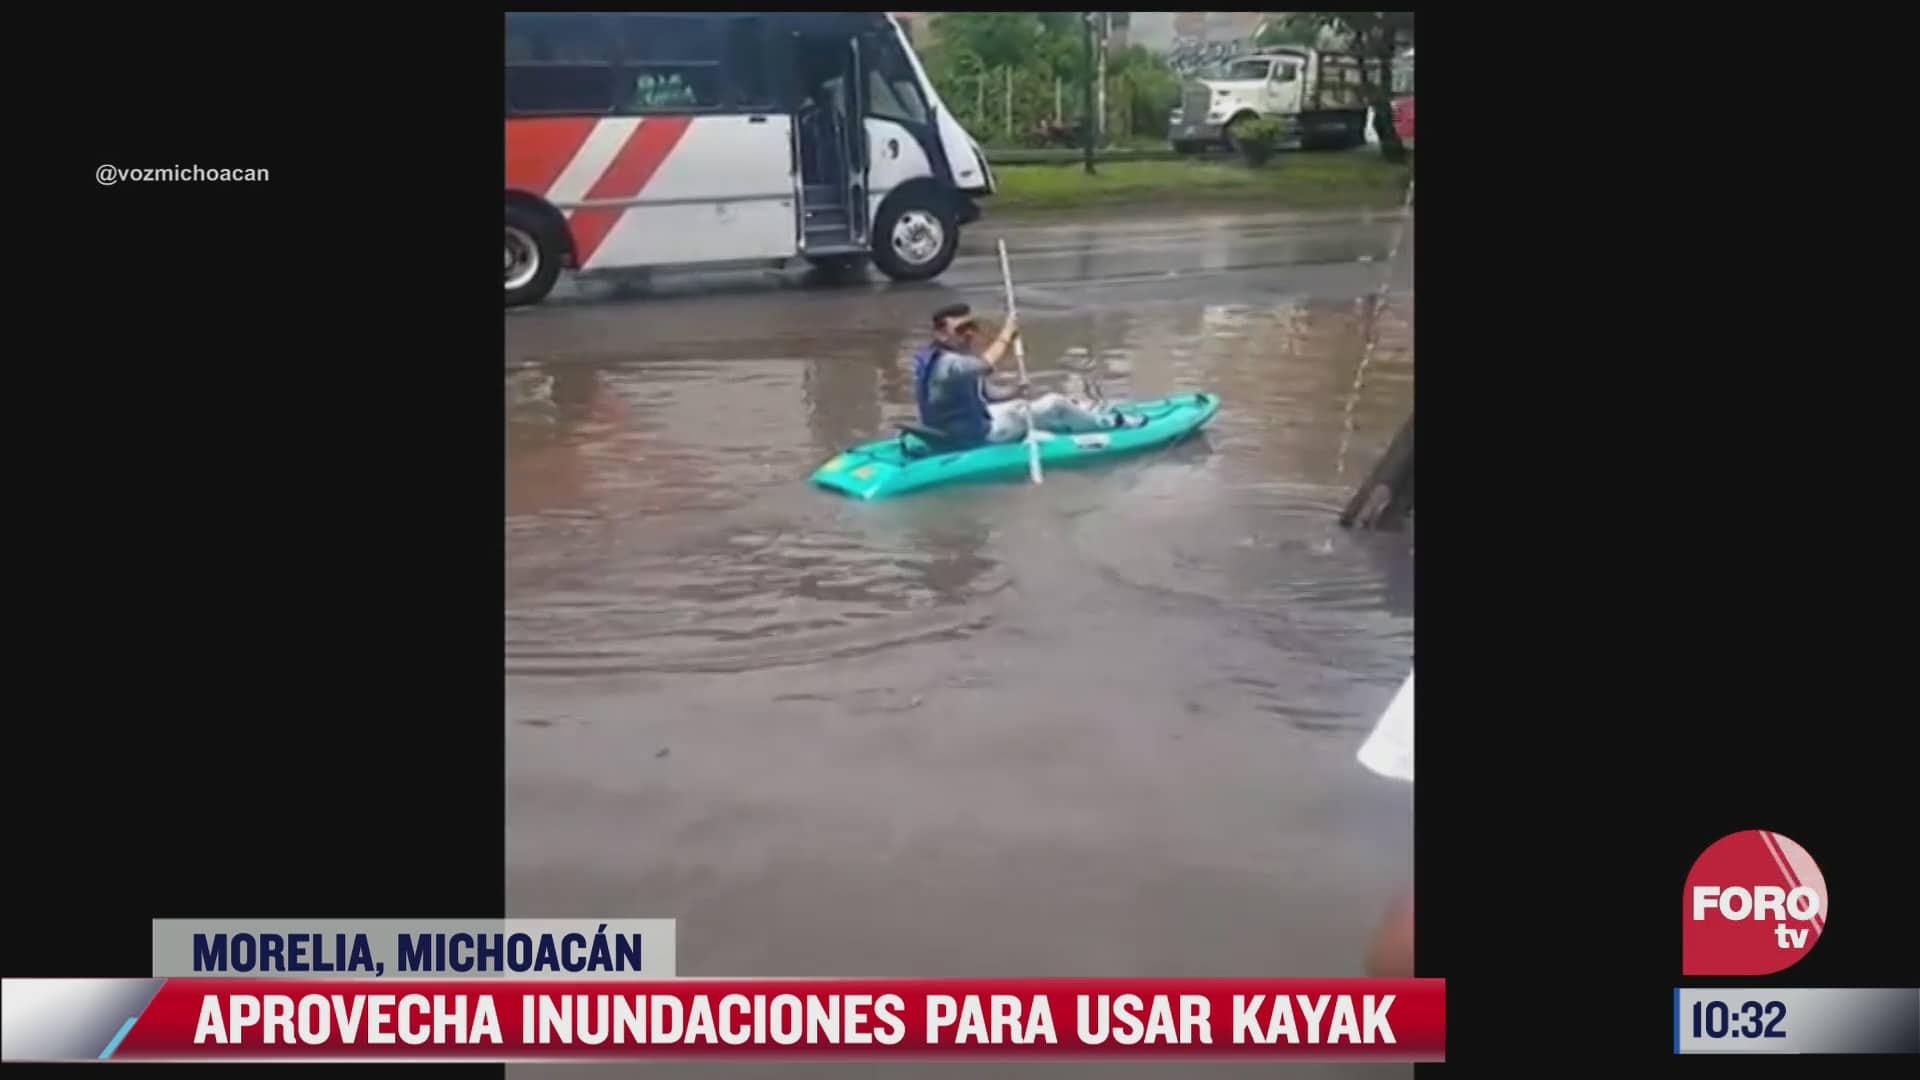 hombre aprovecha inundaciones para usar kayak